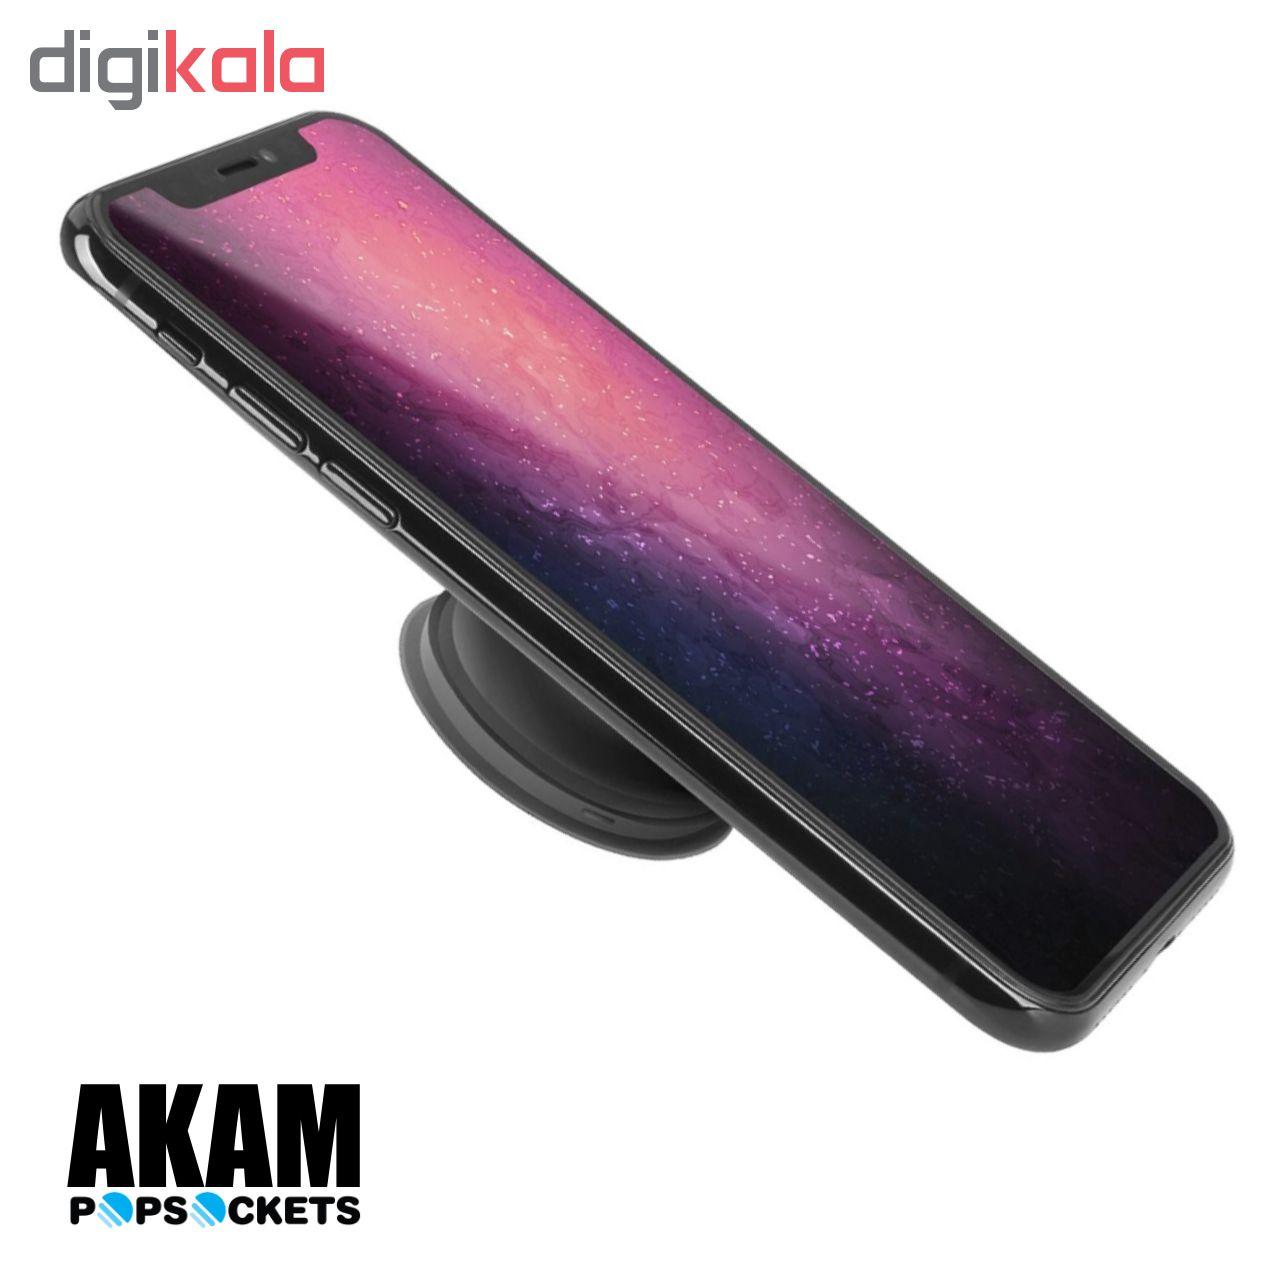 پایه نگهدارنده گوشی موبایل پاپ سوکت آکام مدل APS0079 main 1 7